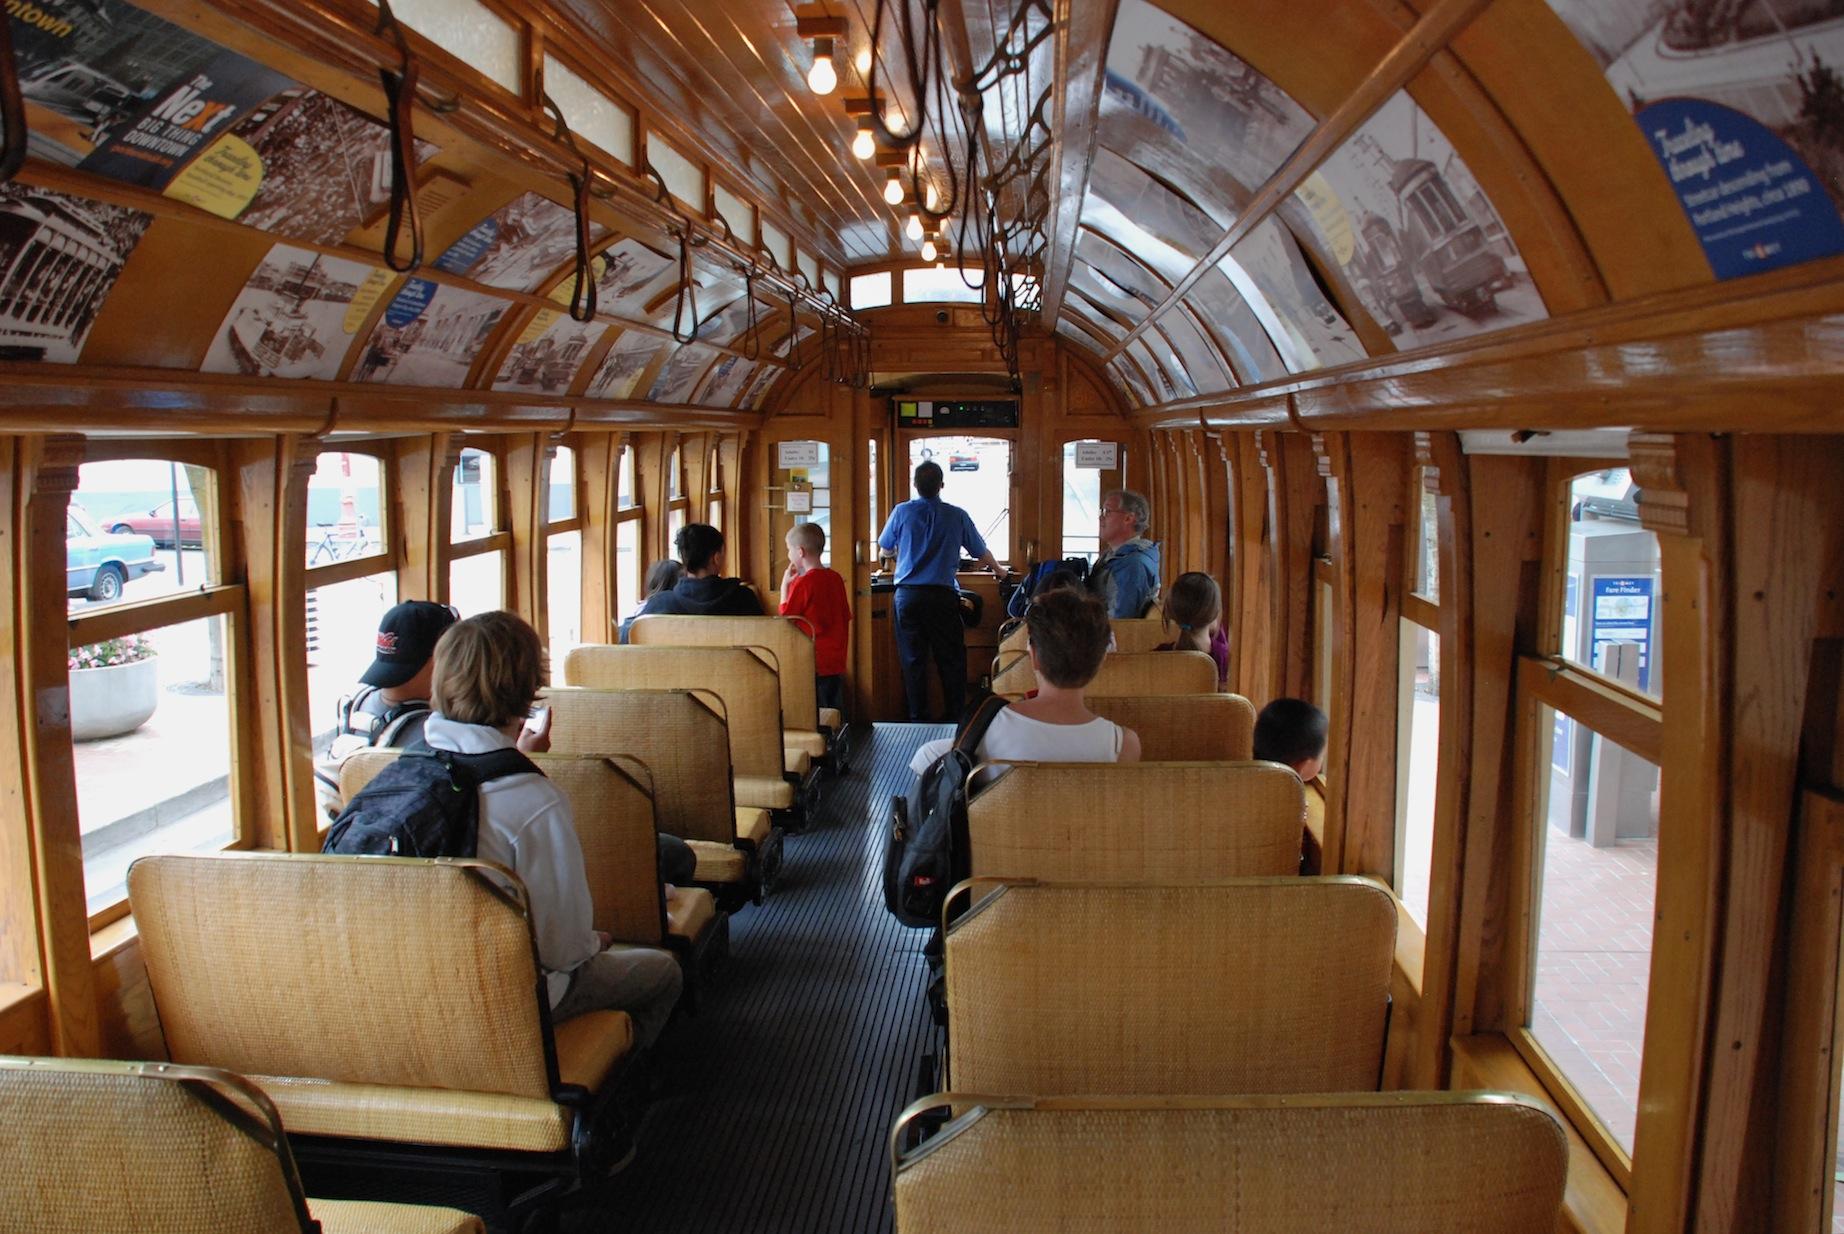 file portland vintage trolley wikimedia commons. Black Bedroom Furniture Sets. Home Design Ideas